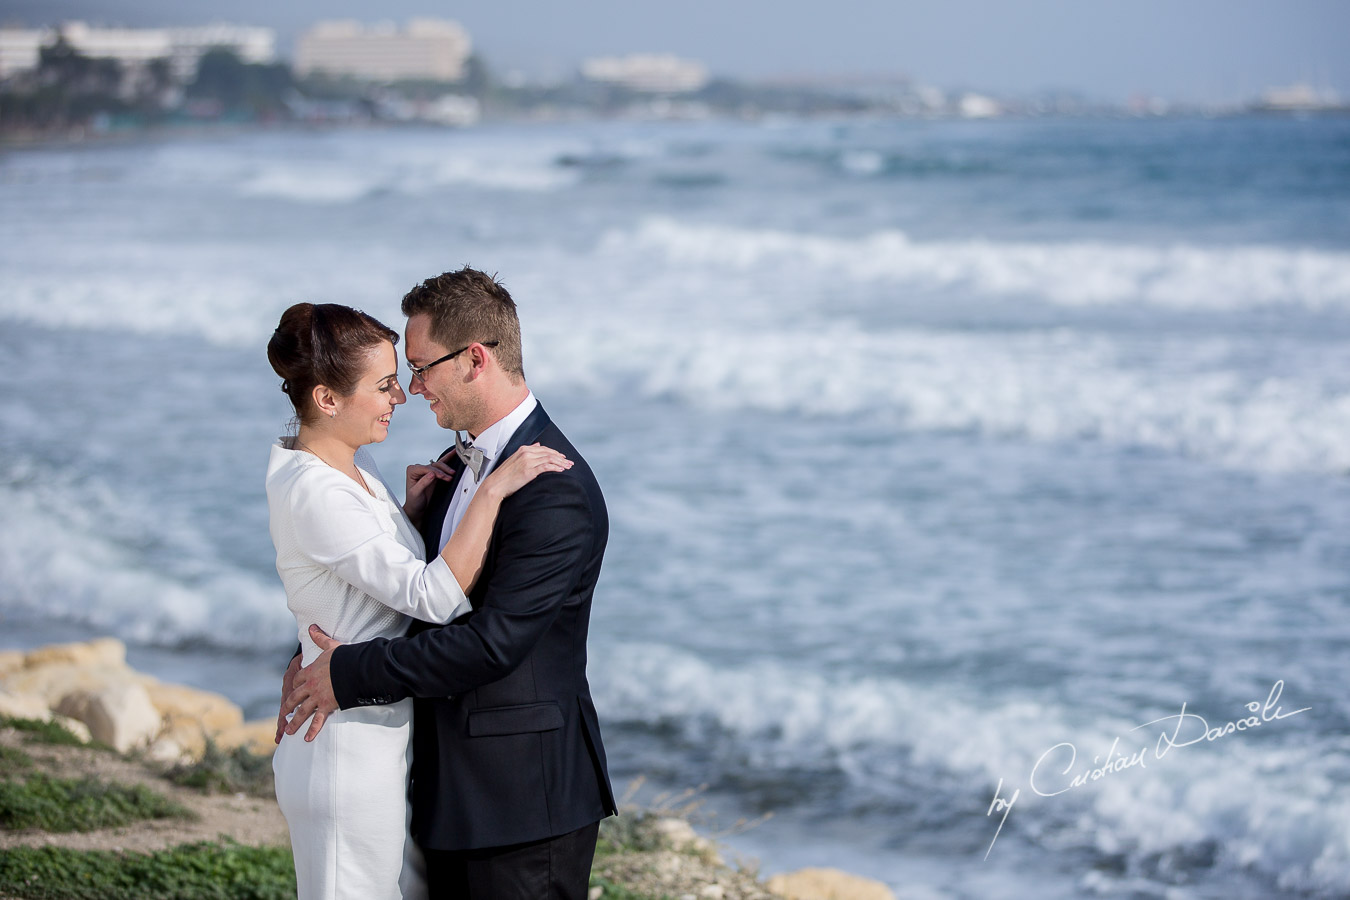 Simple Marriage Ceremony - Irina & Dragos 20